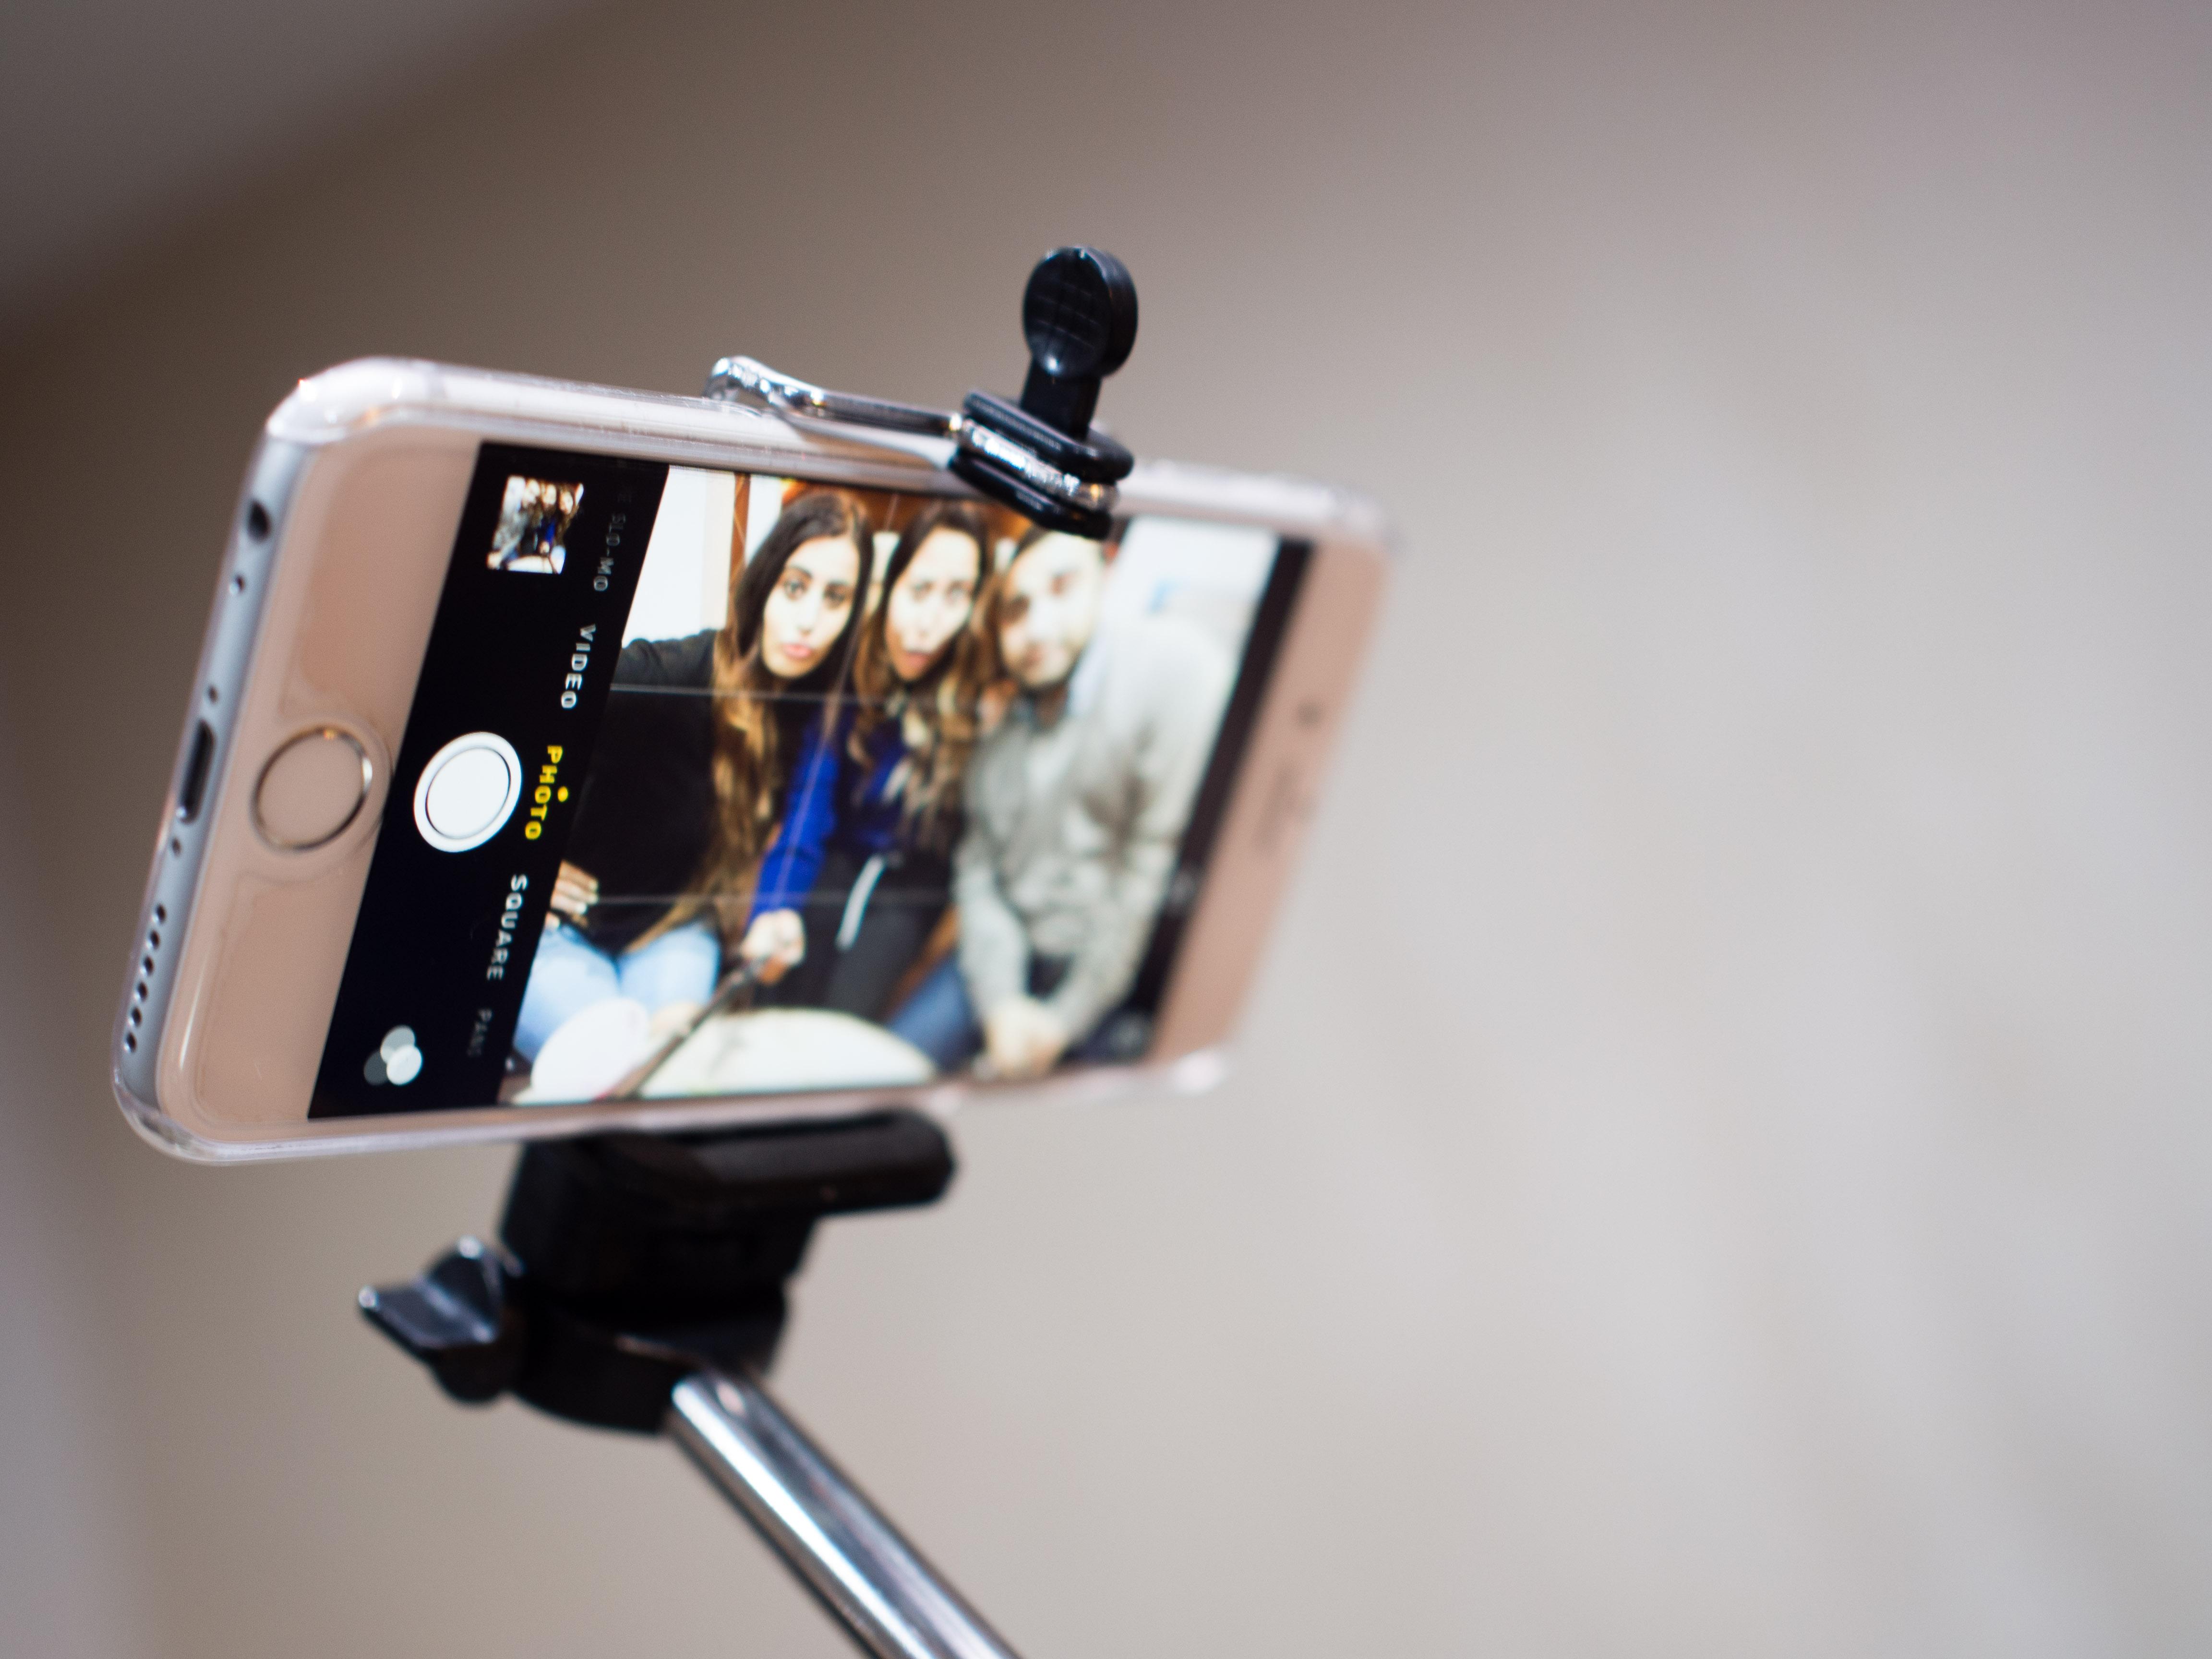 Selfie stick review uk dating